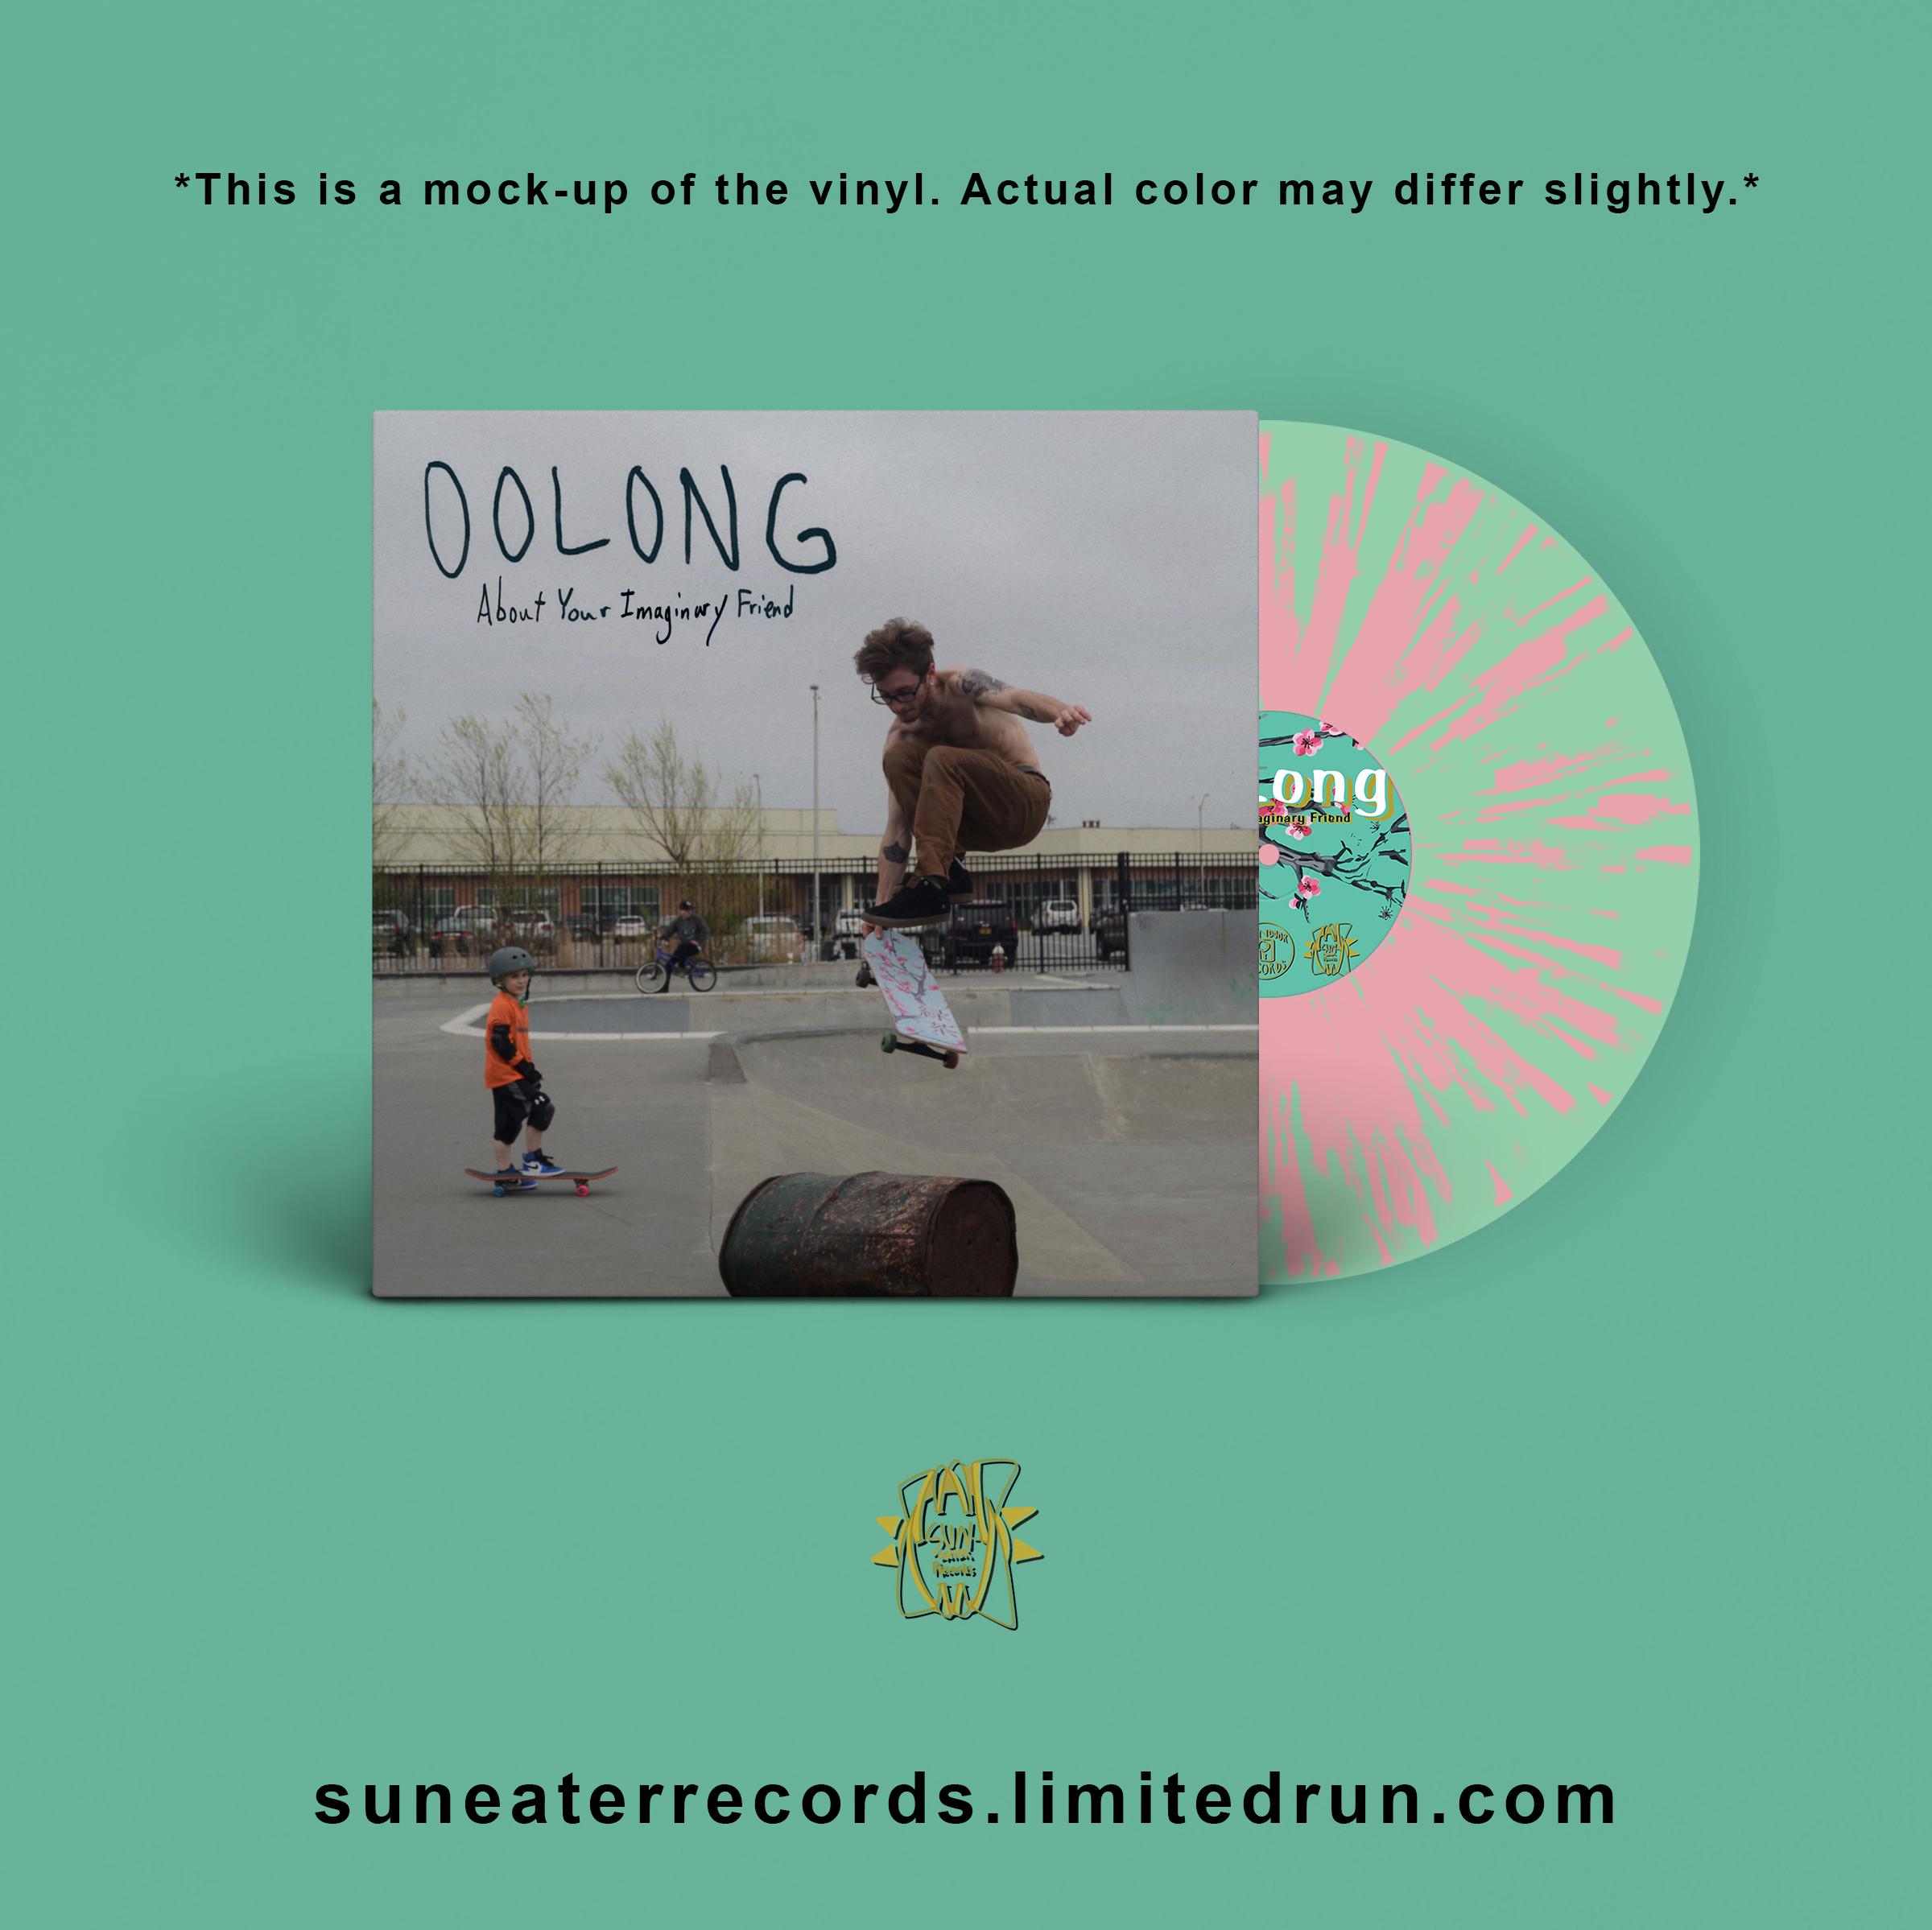 Oolong -